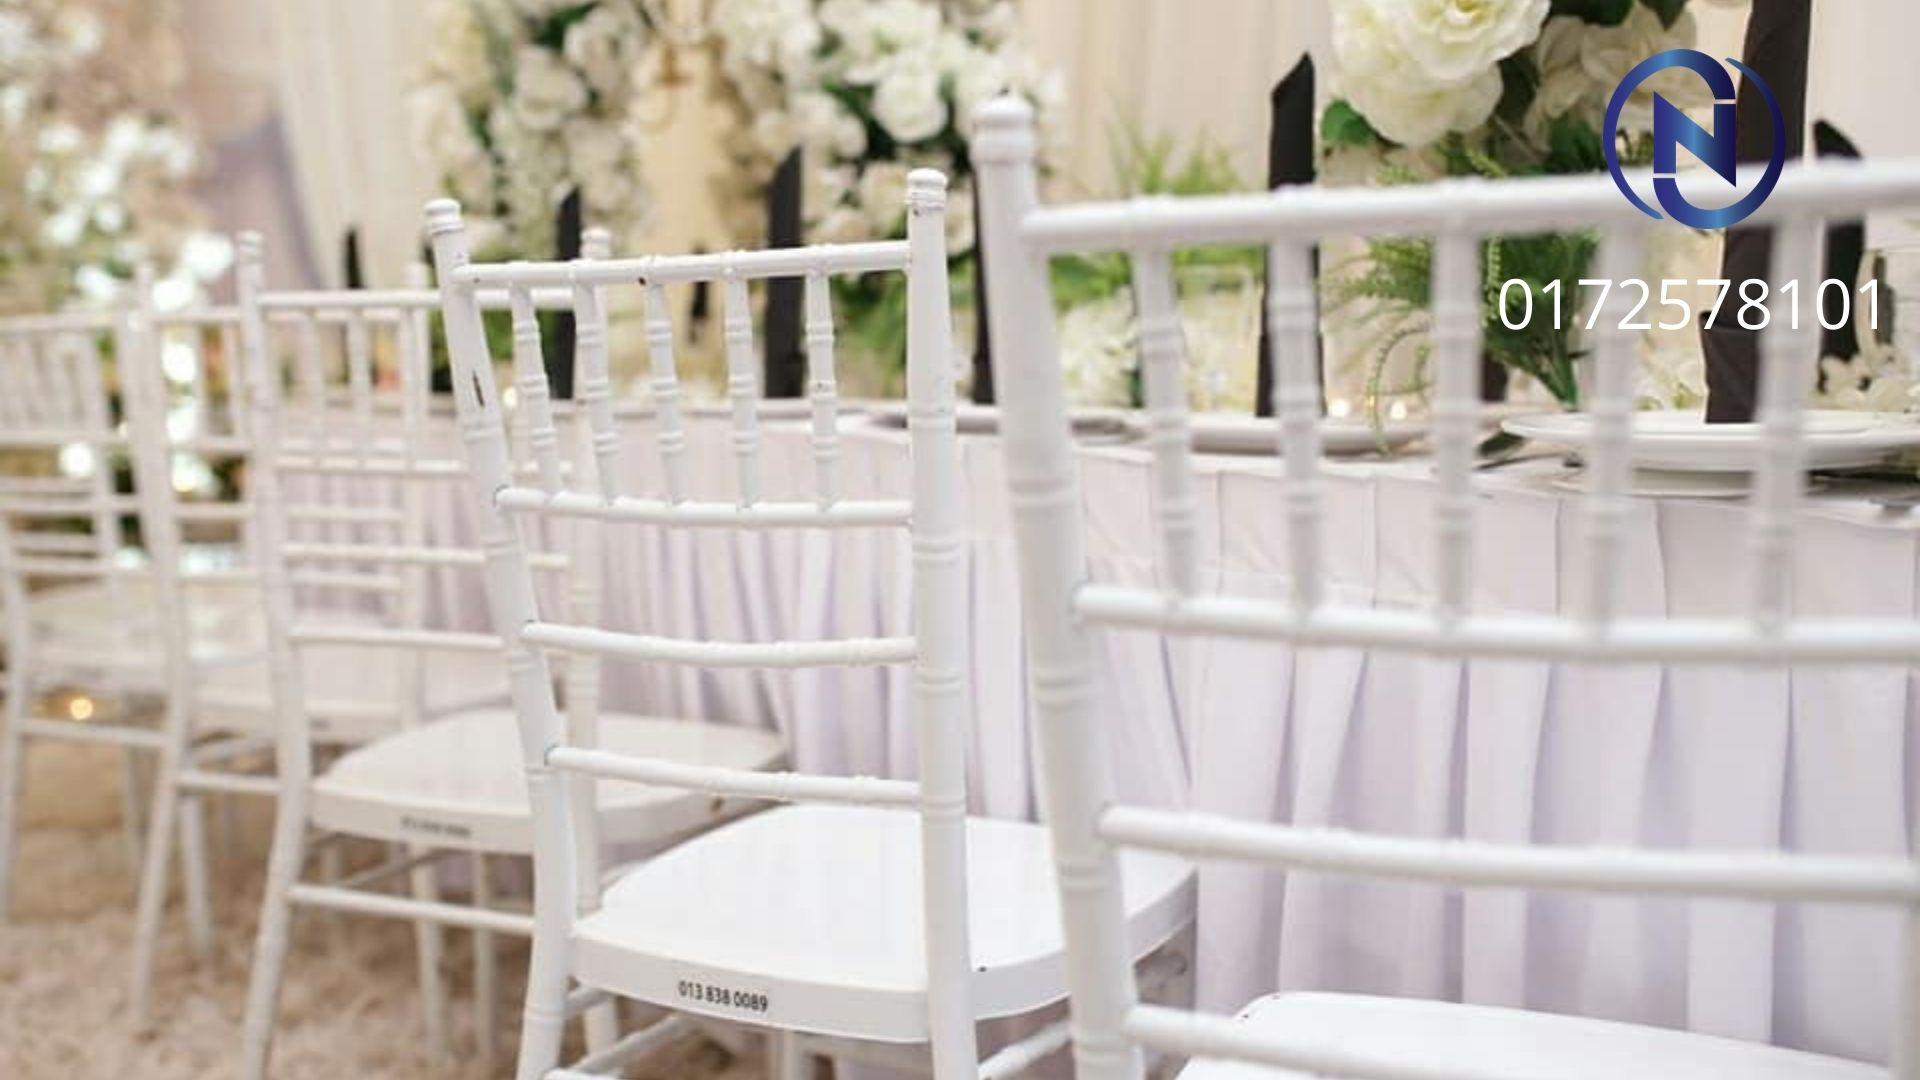 najiha-online-pakej-perkahwinan-negeri-sembilan